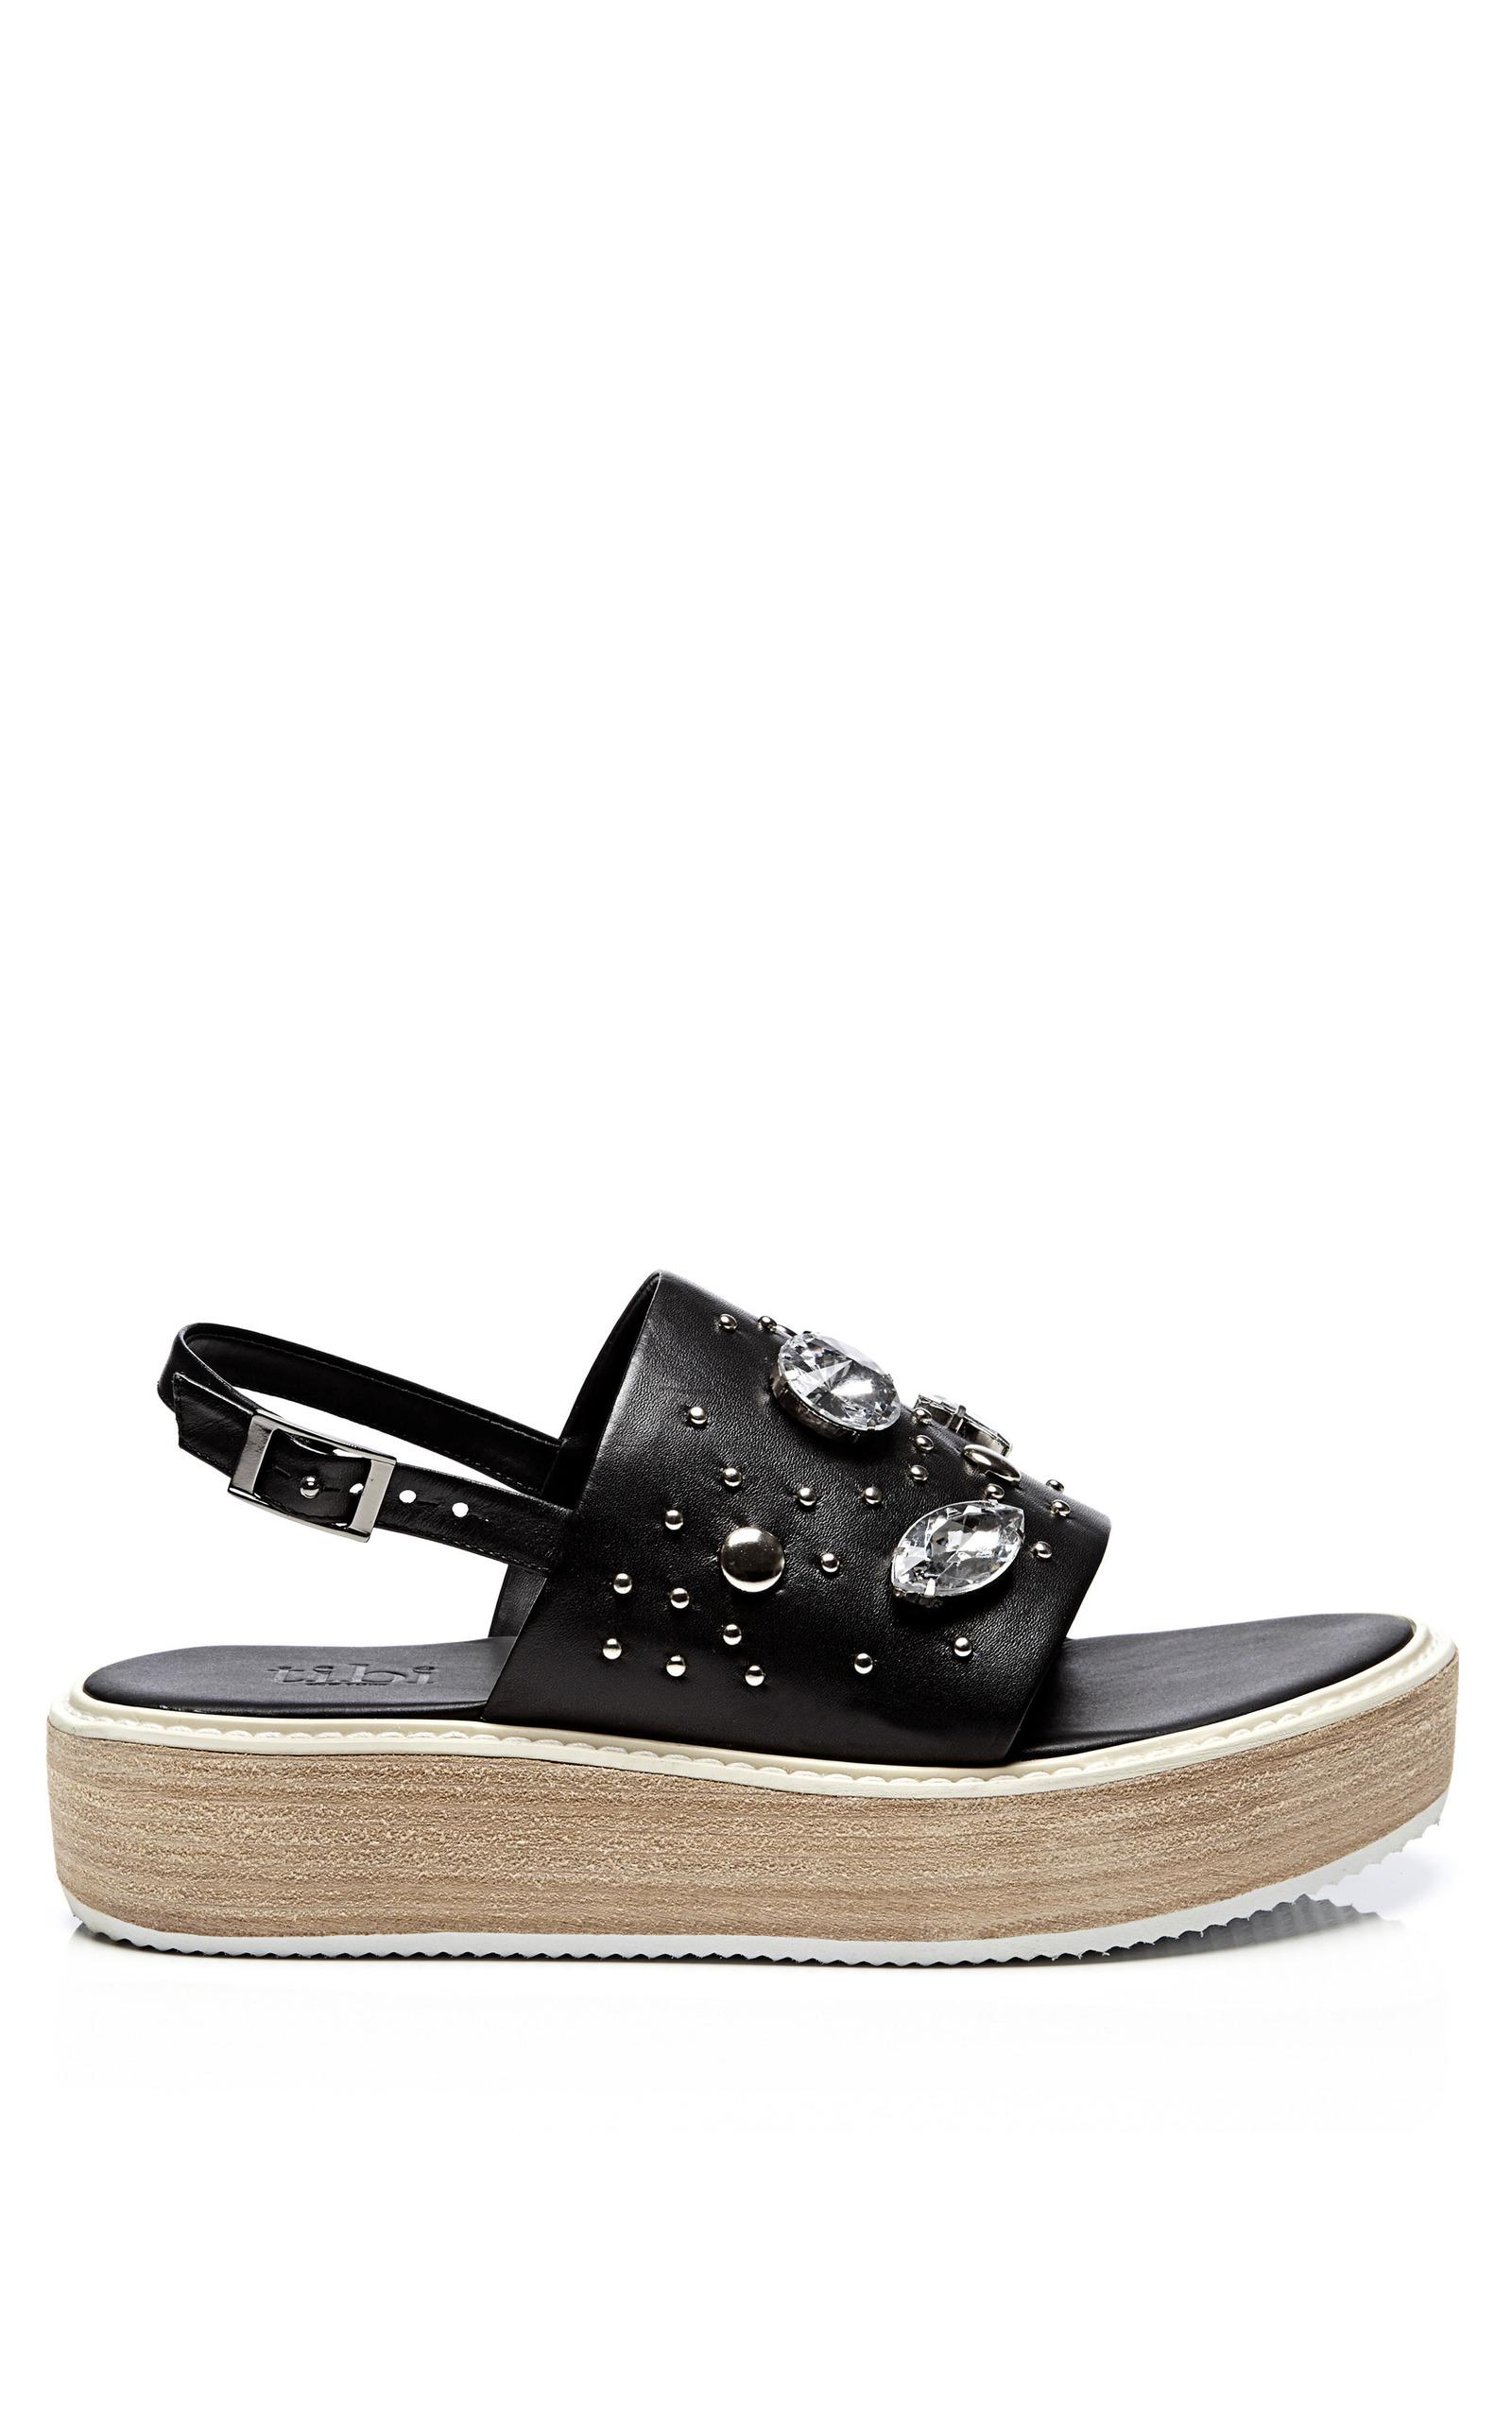 5a8e3ffe412 TibiEmbellished Leather Platform Sandals. CLOSE. Loading